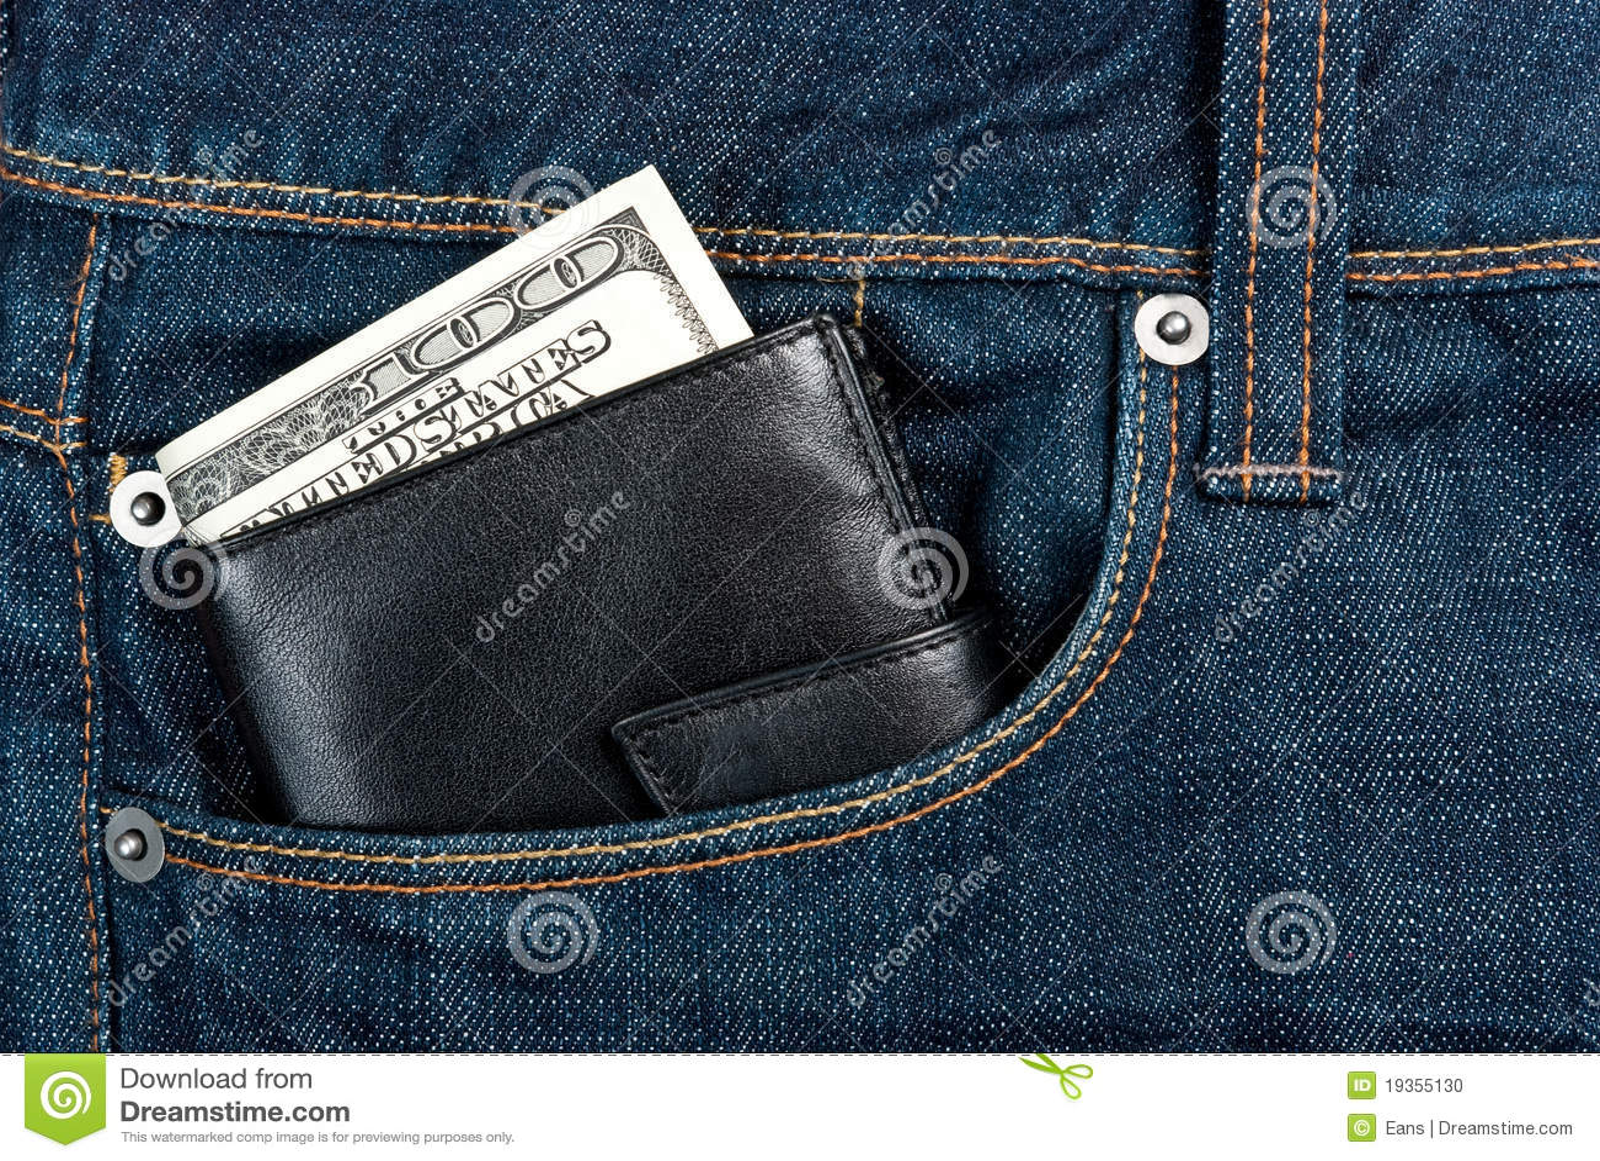 Carteira no bolso